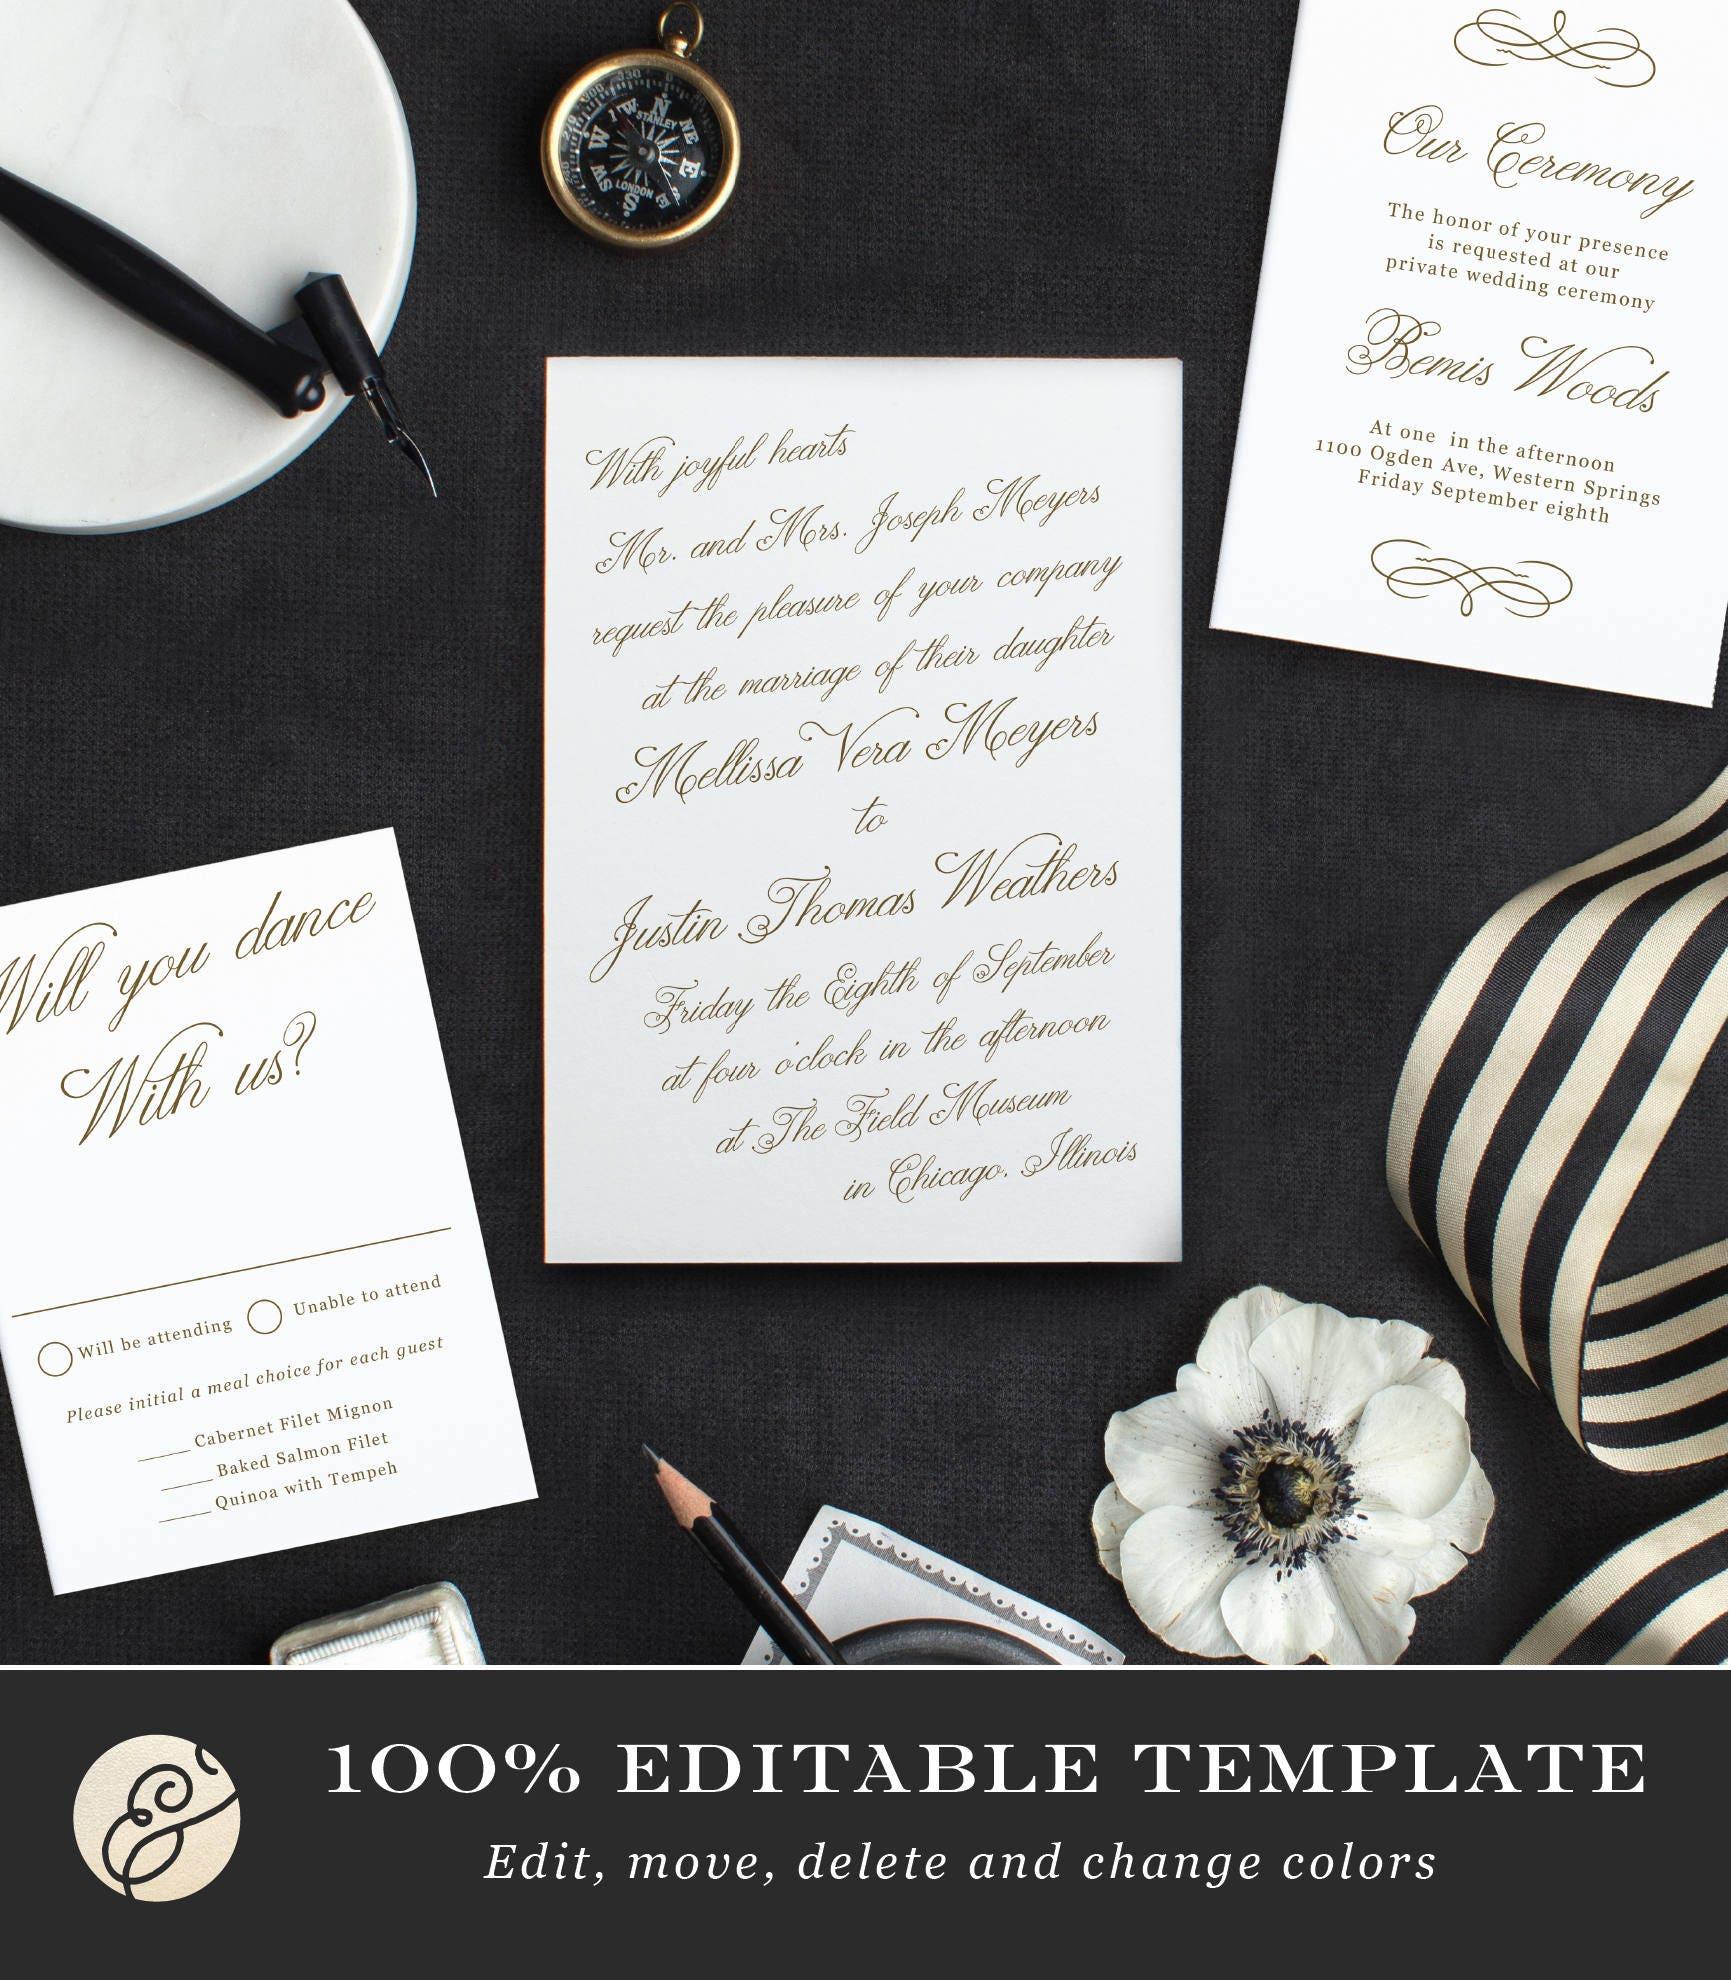 Design Your Own Wedding Invite: Printable Template Design Your Own Wedding Invitation